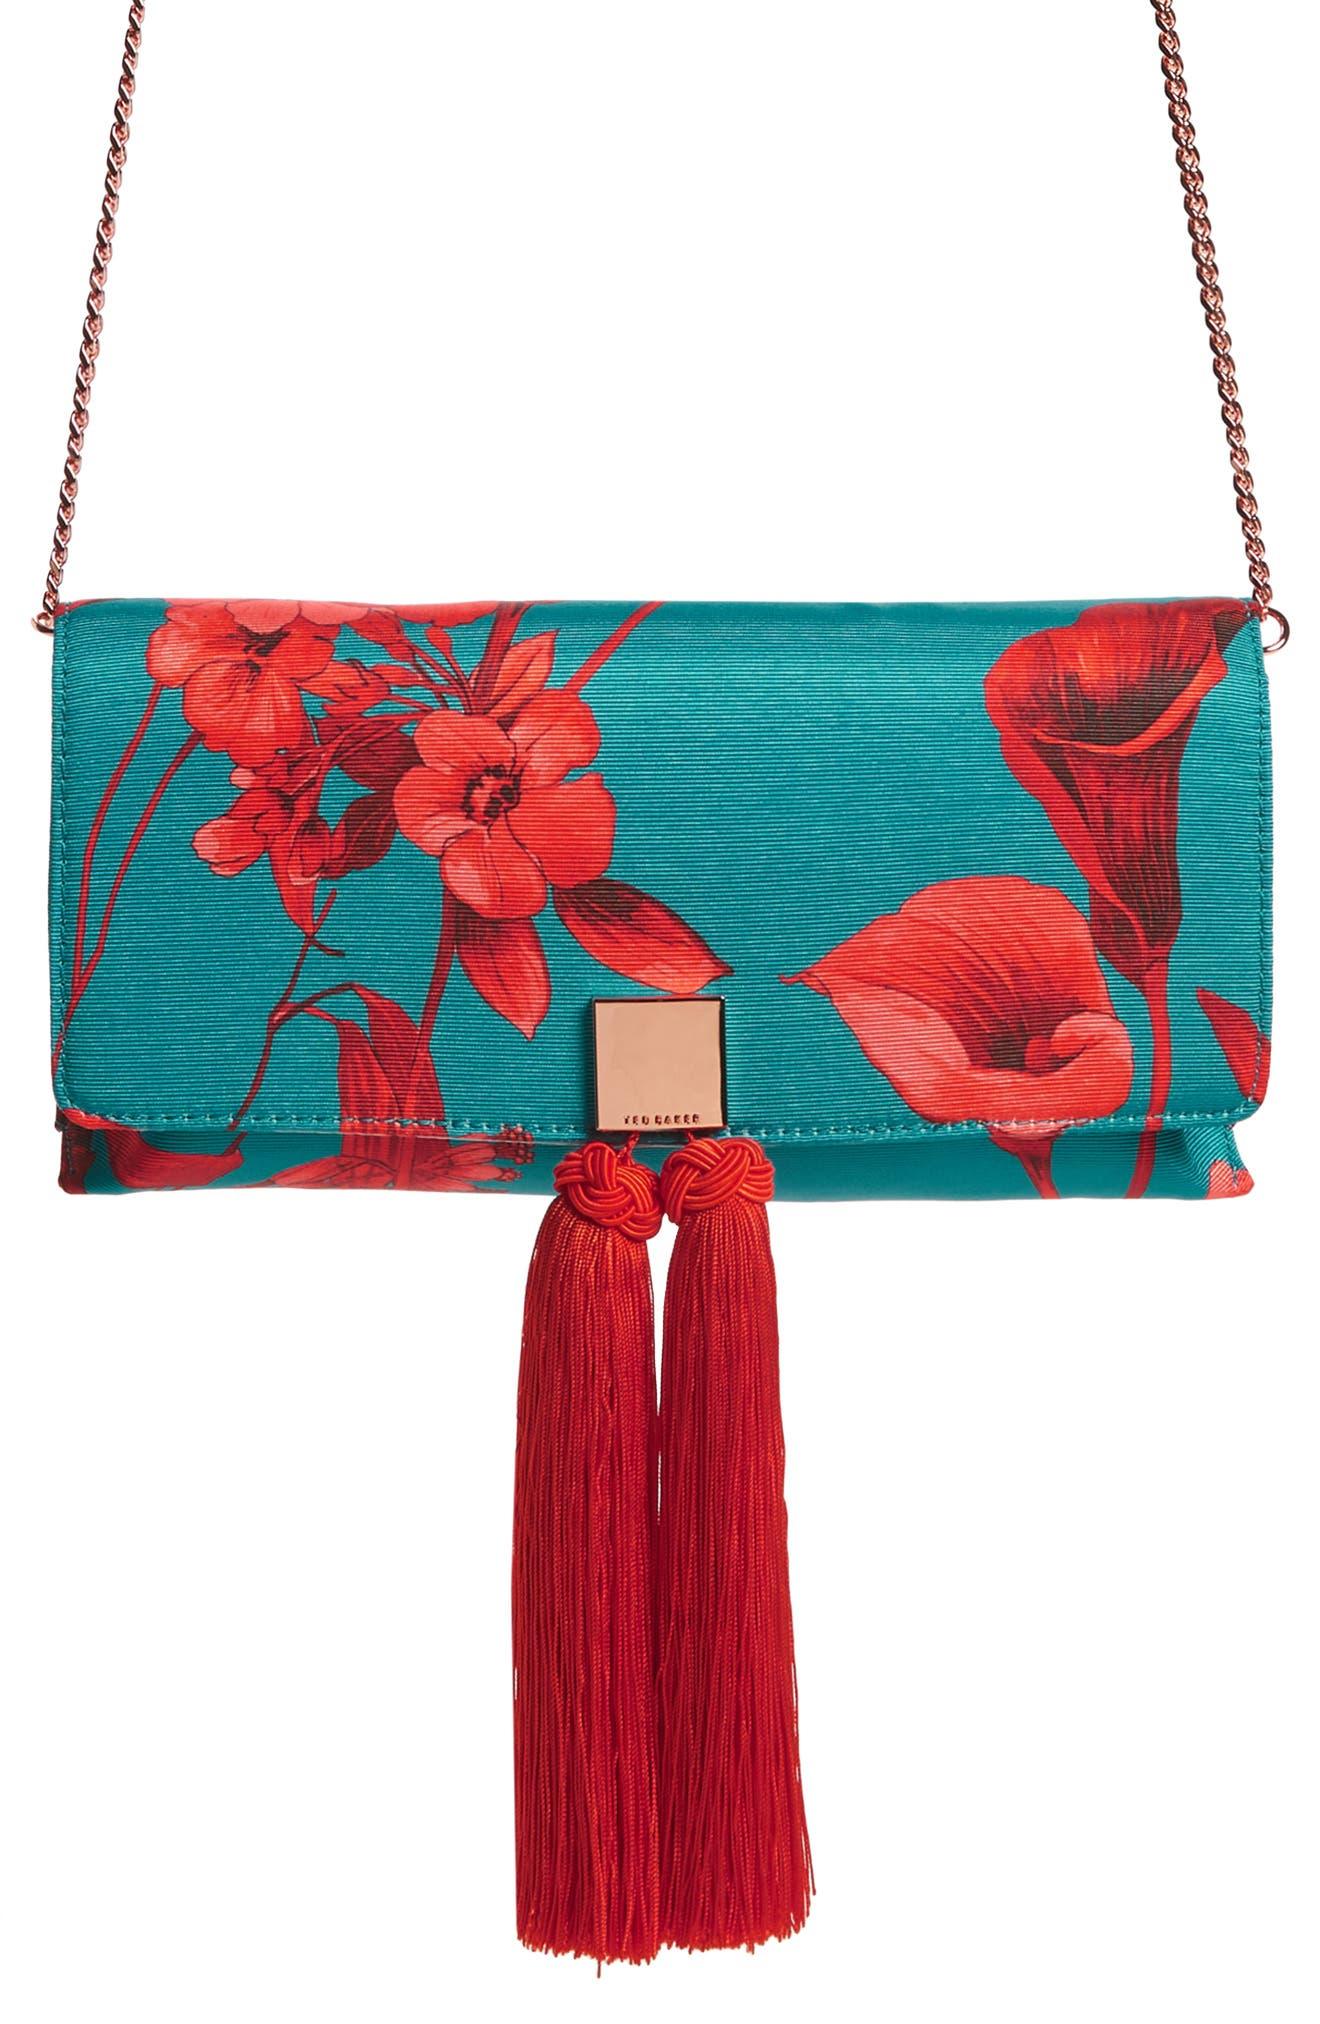 Darlee Fantasia Tassel Bag,                             Main thumbnail 1, color,                             TURQUOISE